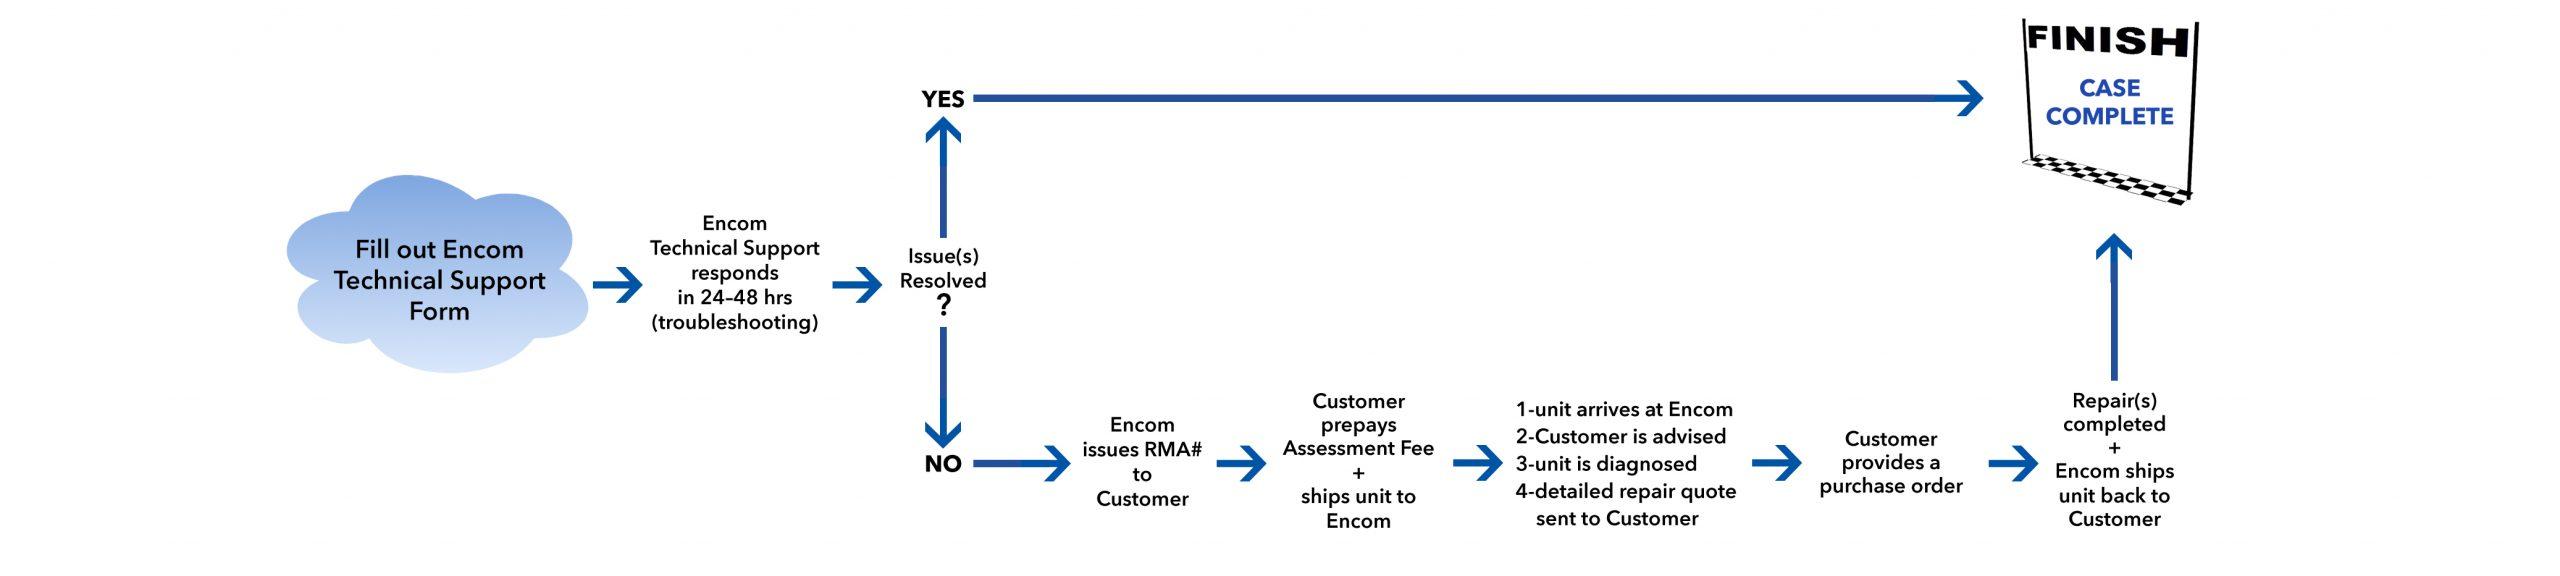 rma-process-flowcustomer-version